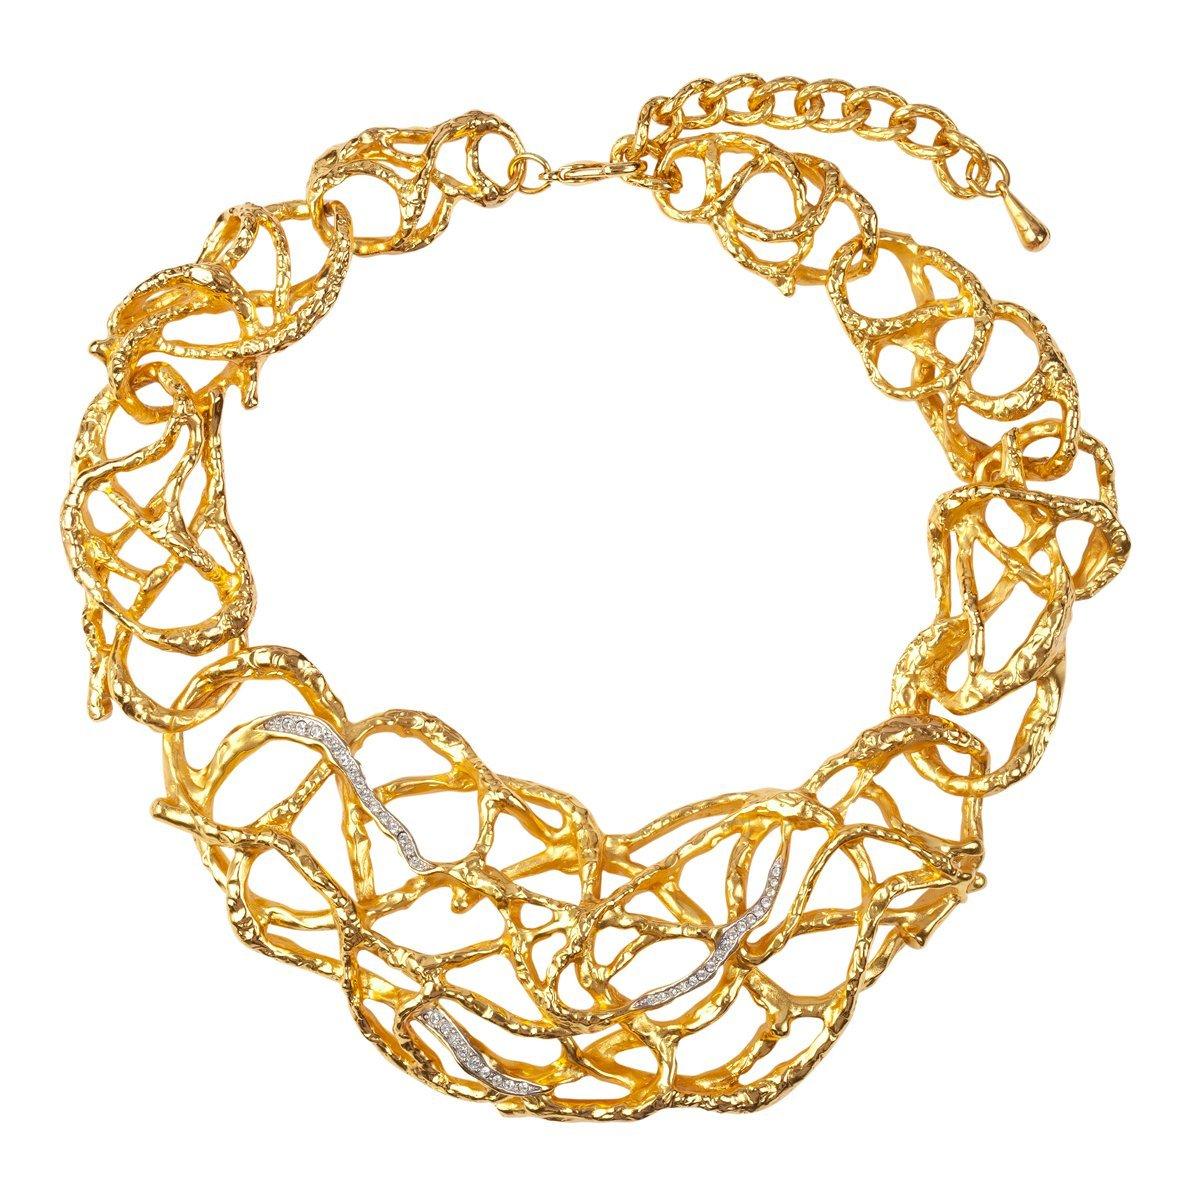 1990S Vintage Elizabeth Taylor Vine Swarovski Crystal Necklace in Metallic